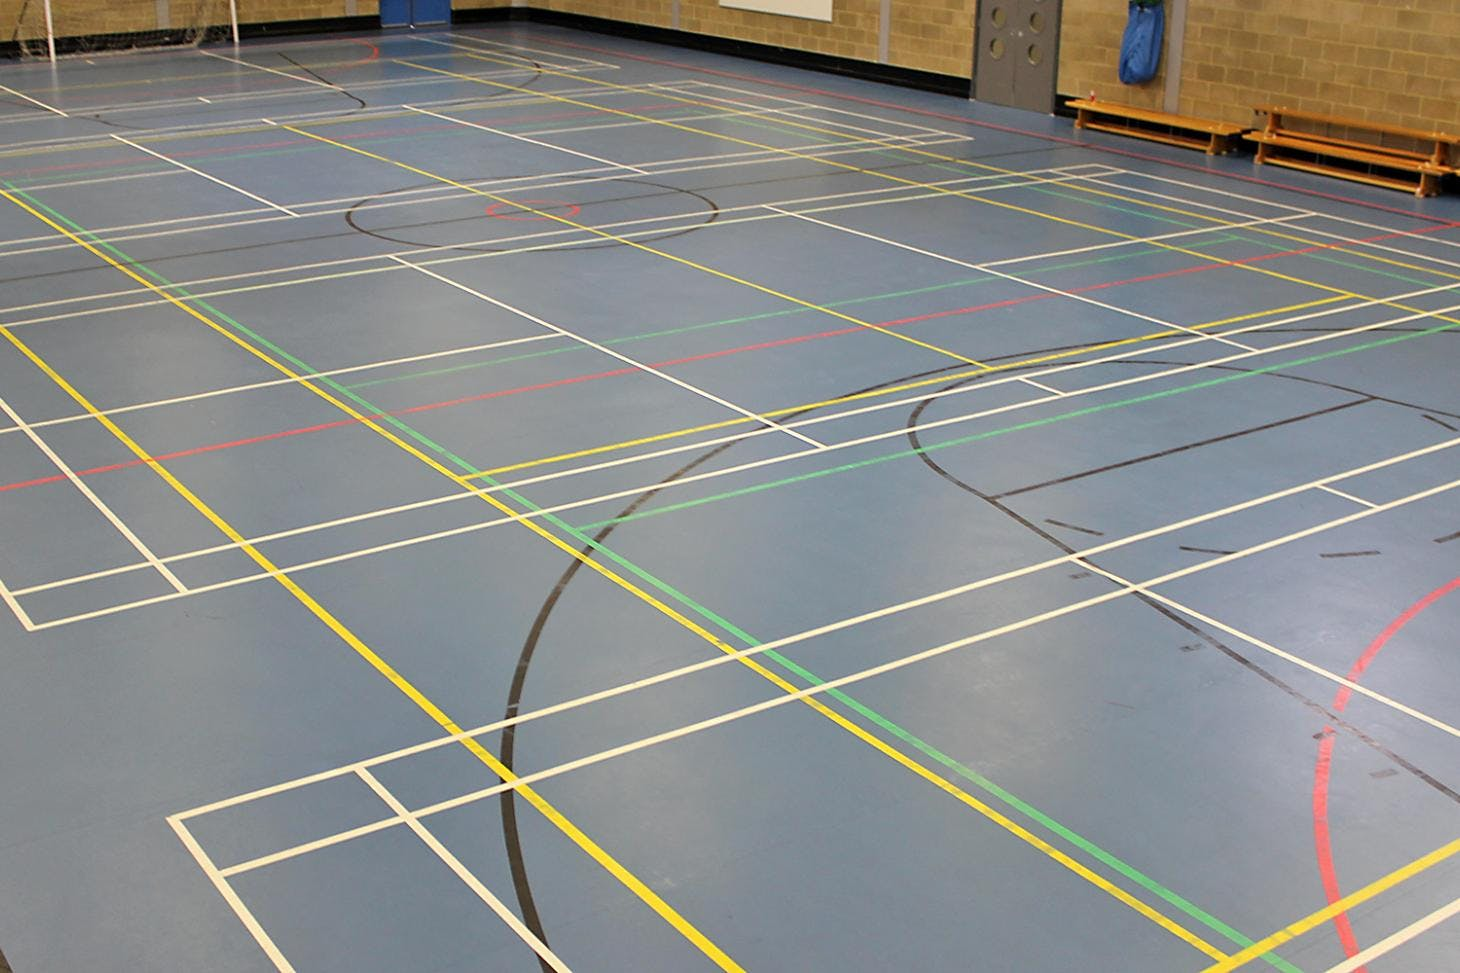 Harris Academy Purley Nets | Artificial cricket facilities